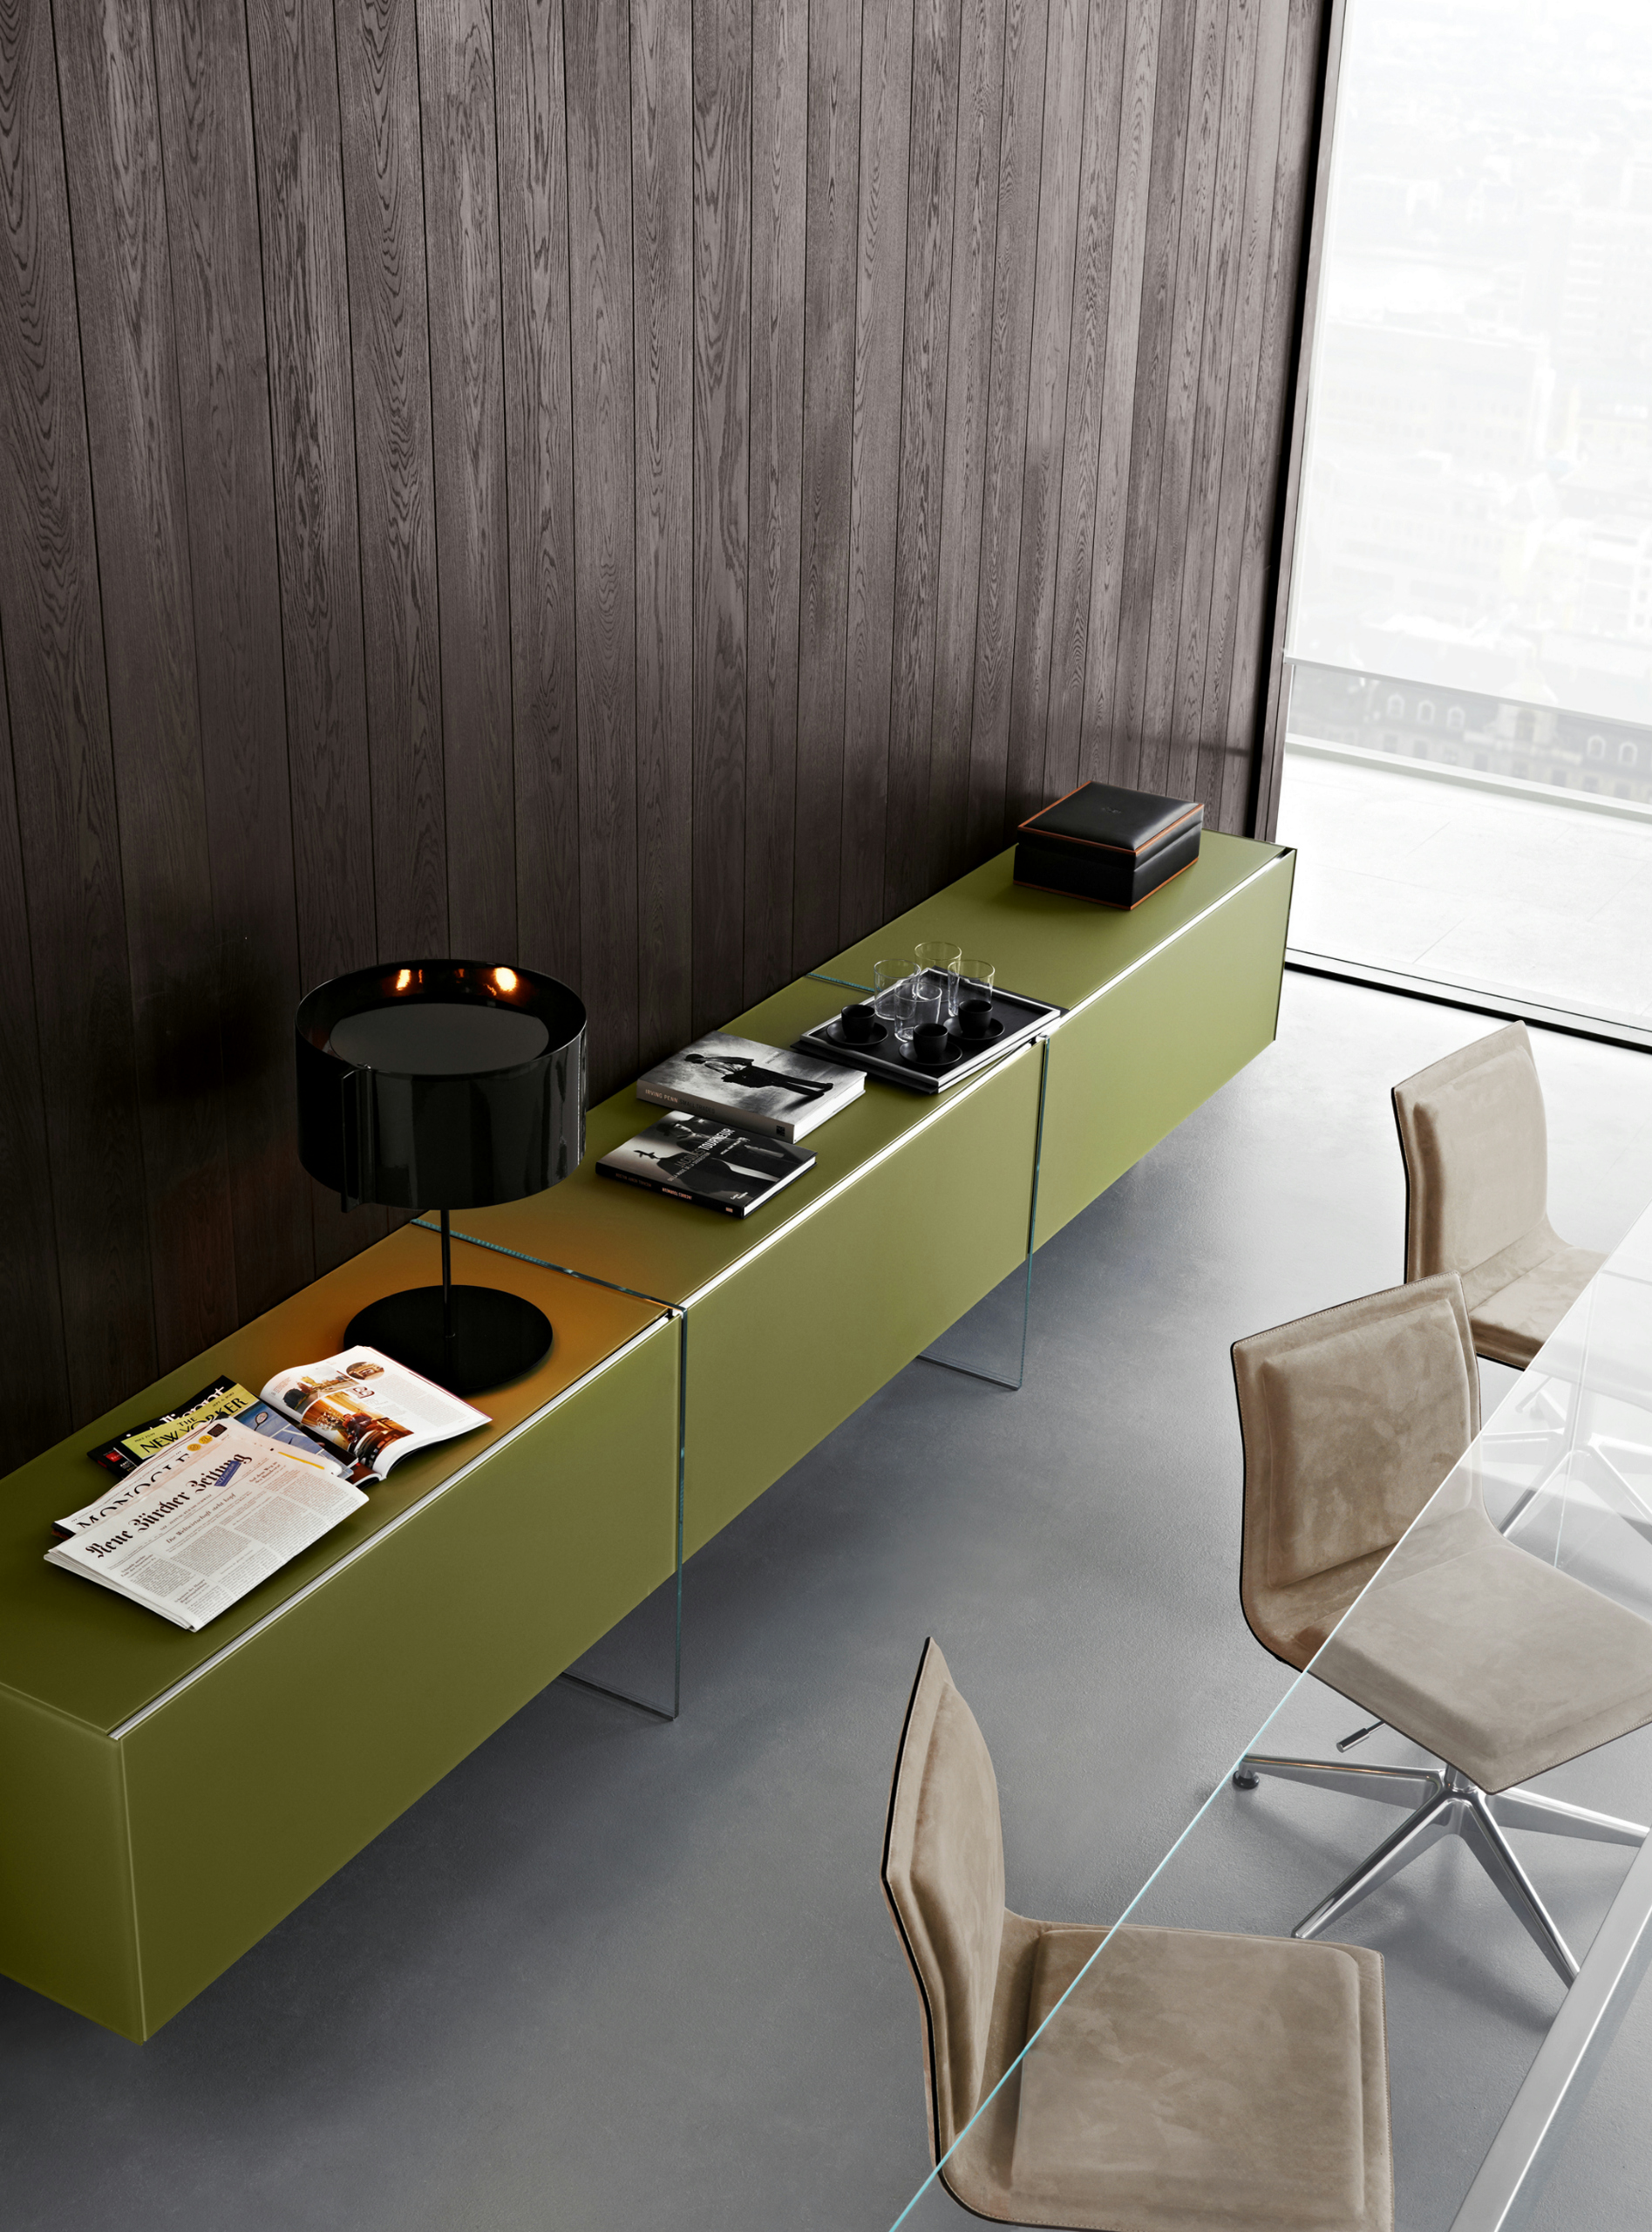 freestanding modular storage unit air unit by gallotti radice design pinuccio borgonovo. Black Bedroom Furniture Sets. Home Design Ideas